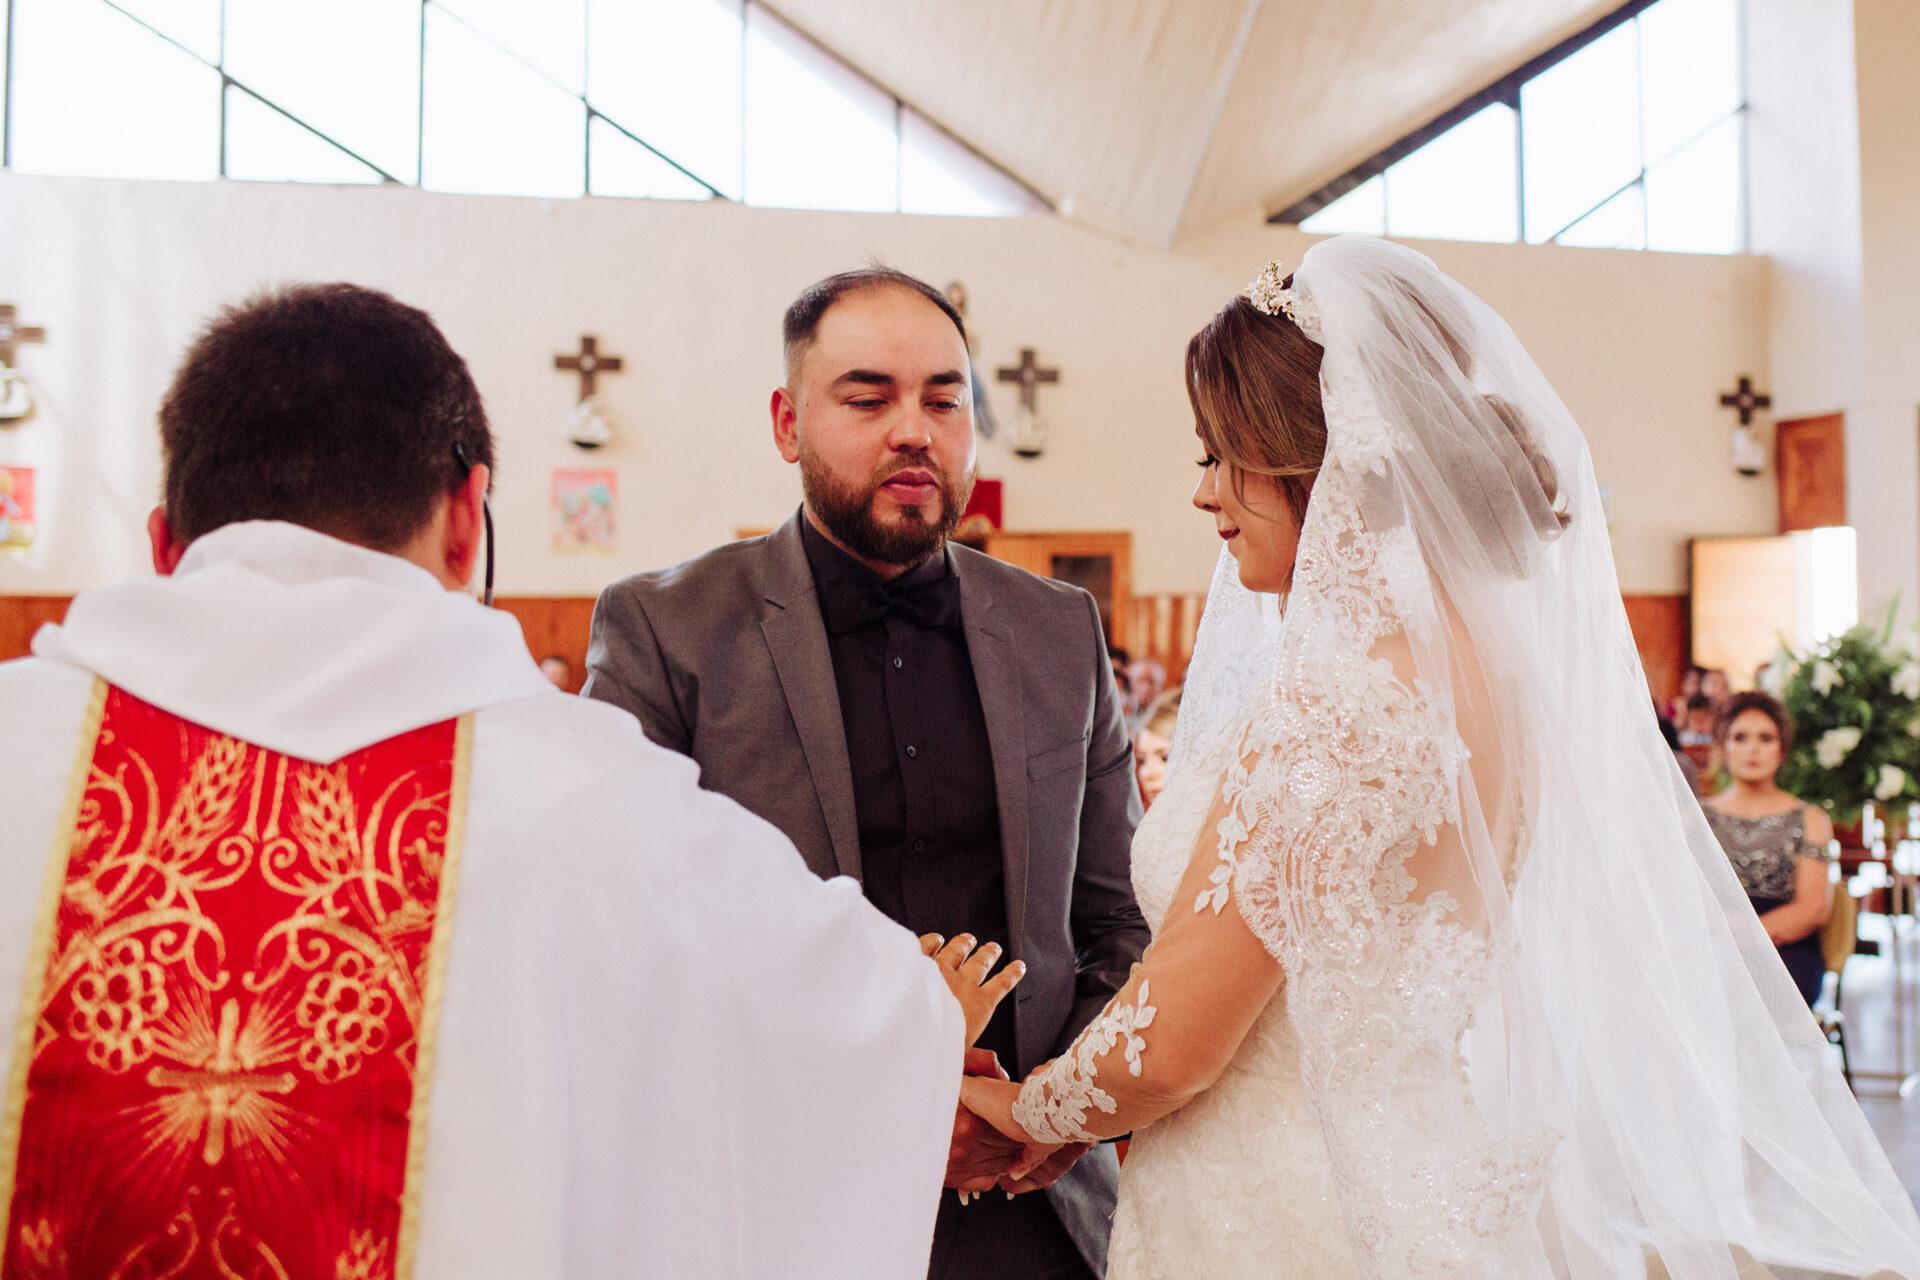 javier_noriega_fotografo_bodas_zacatecas_fresnillo_chihuahua_wedding_photographer7